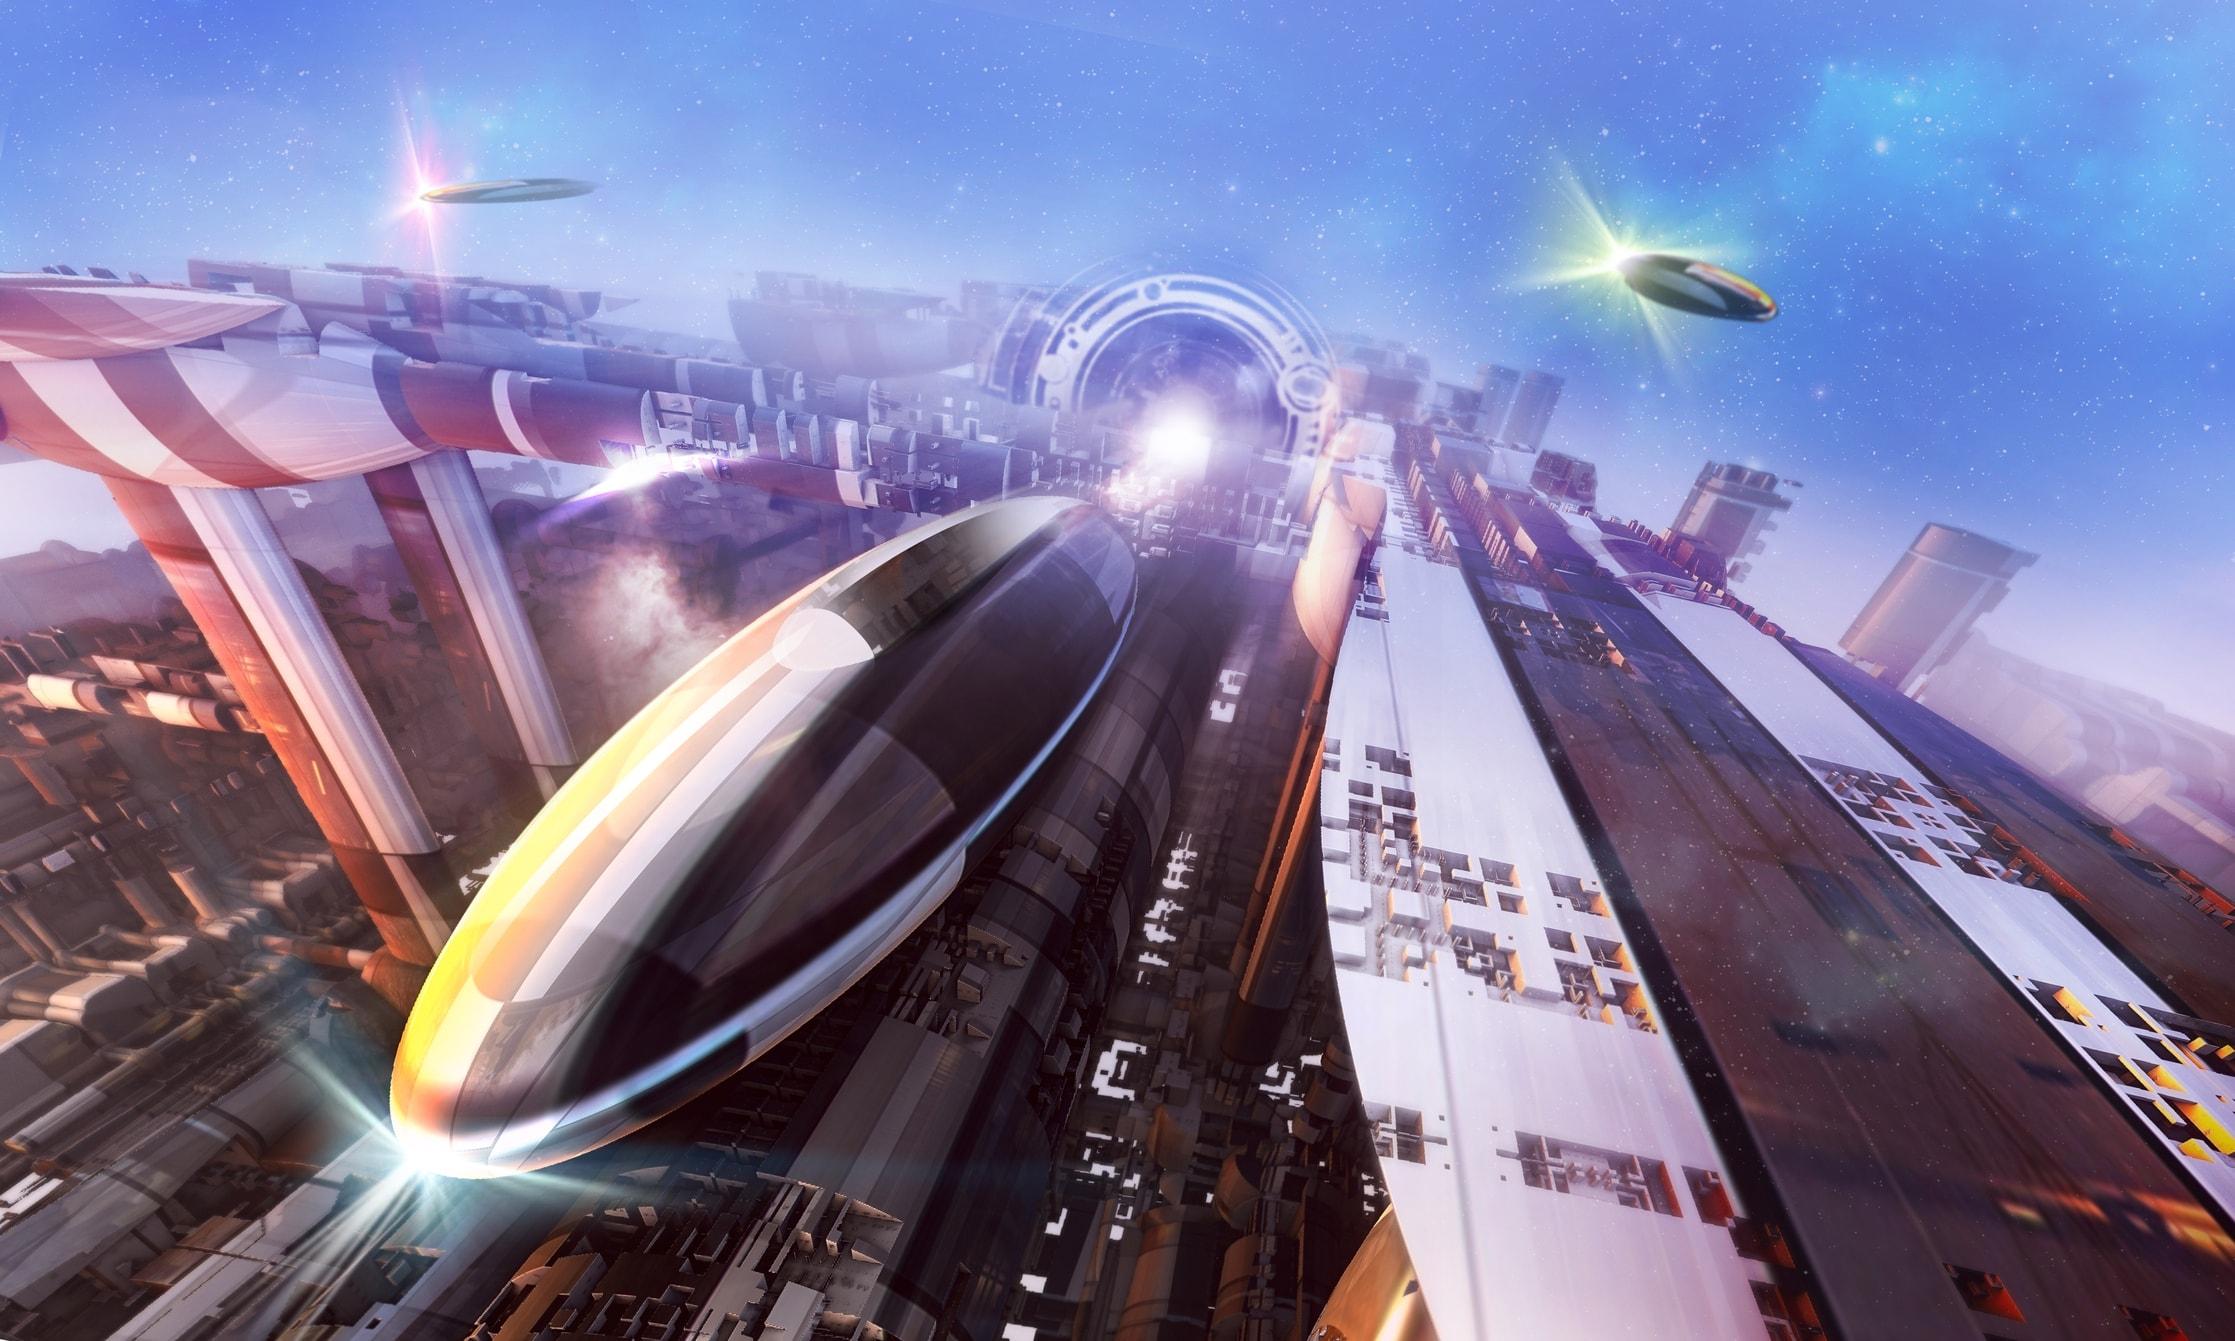 Hyperloop hoverboard sea bubble zoom sur les transports - Www oney fr ...